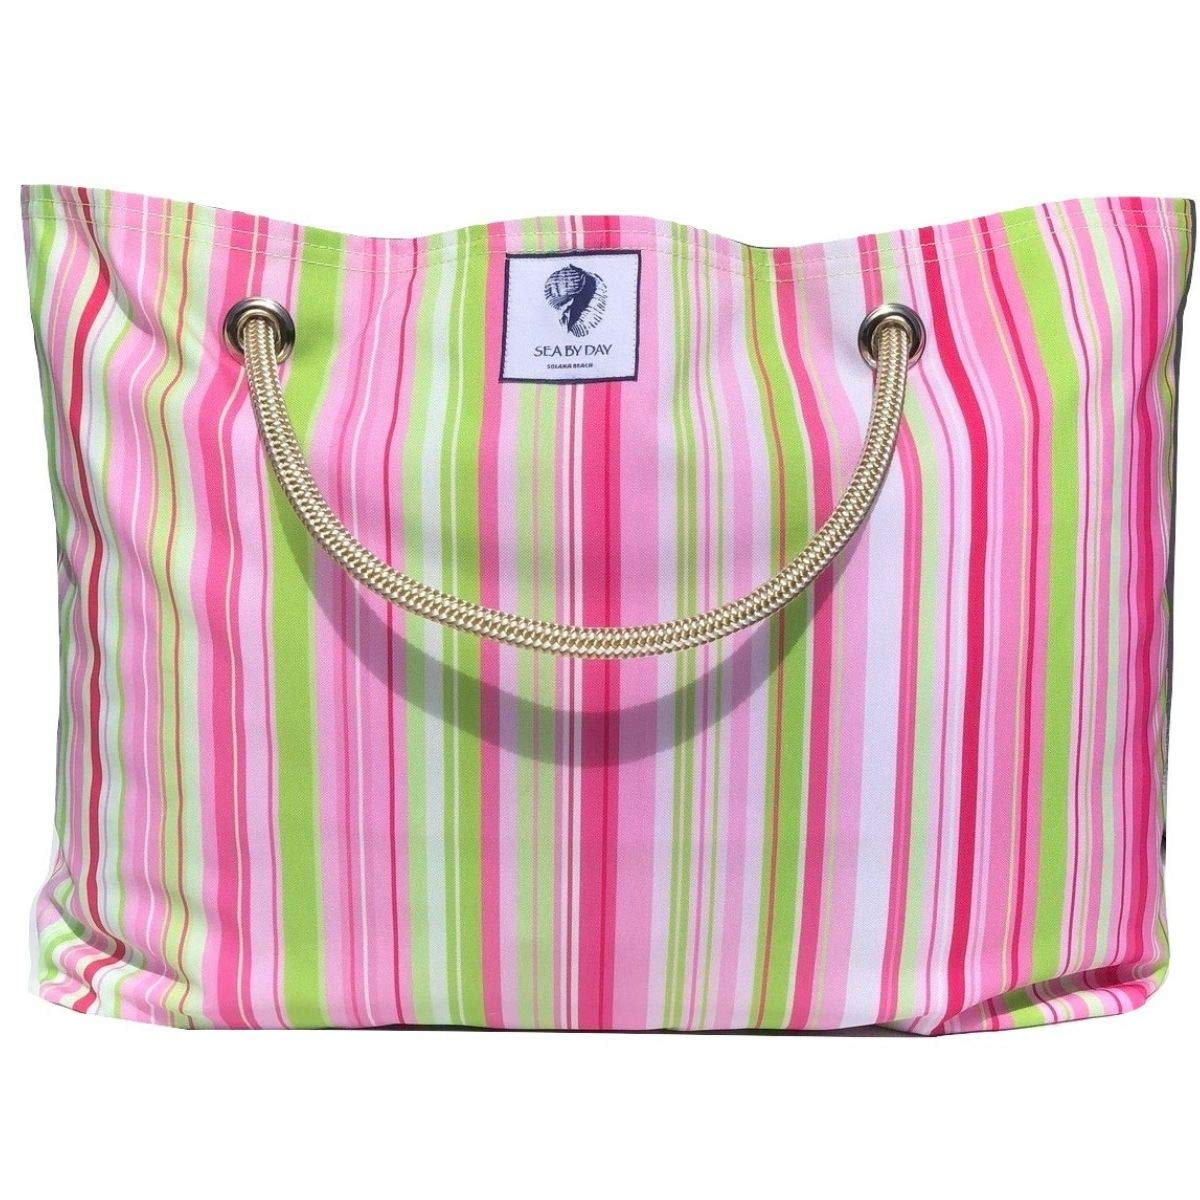 LARGE BEACH BAG Tote Bag for Women, Colorful Waterproof totes